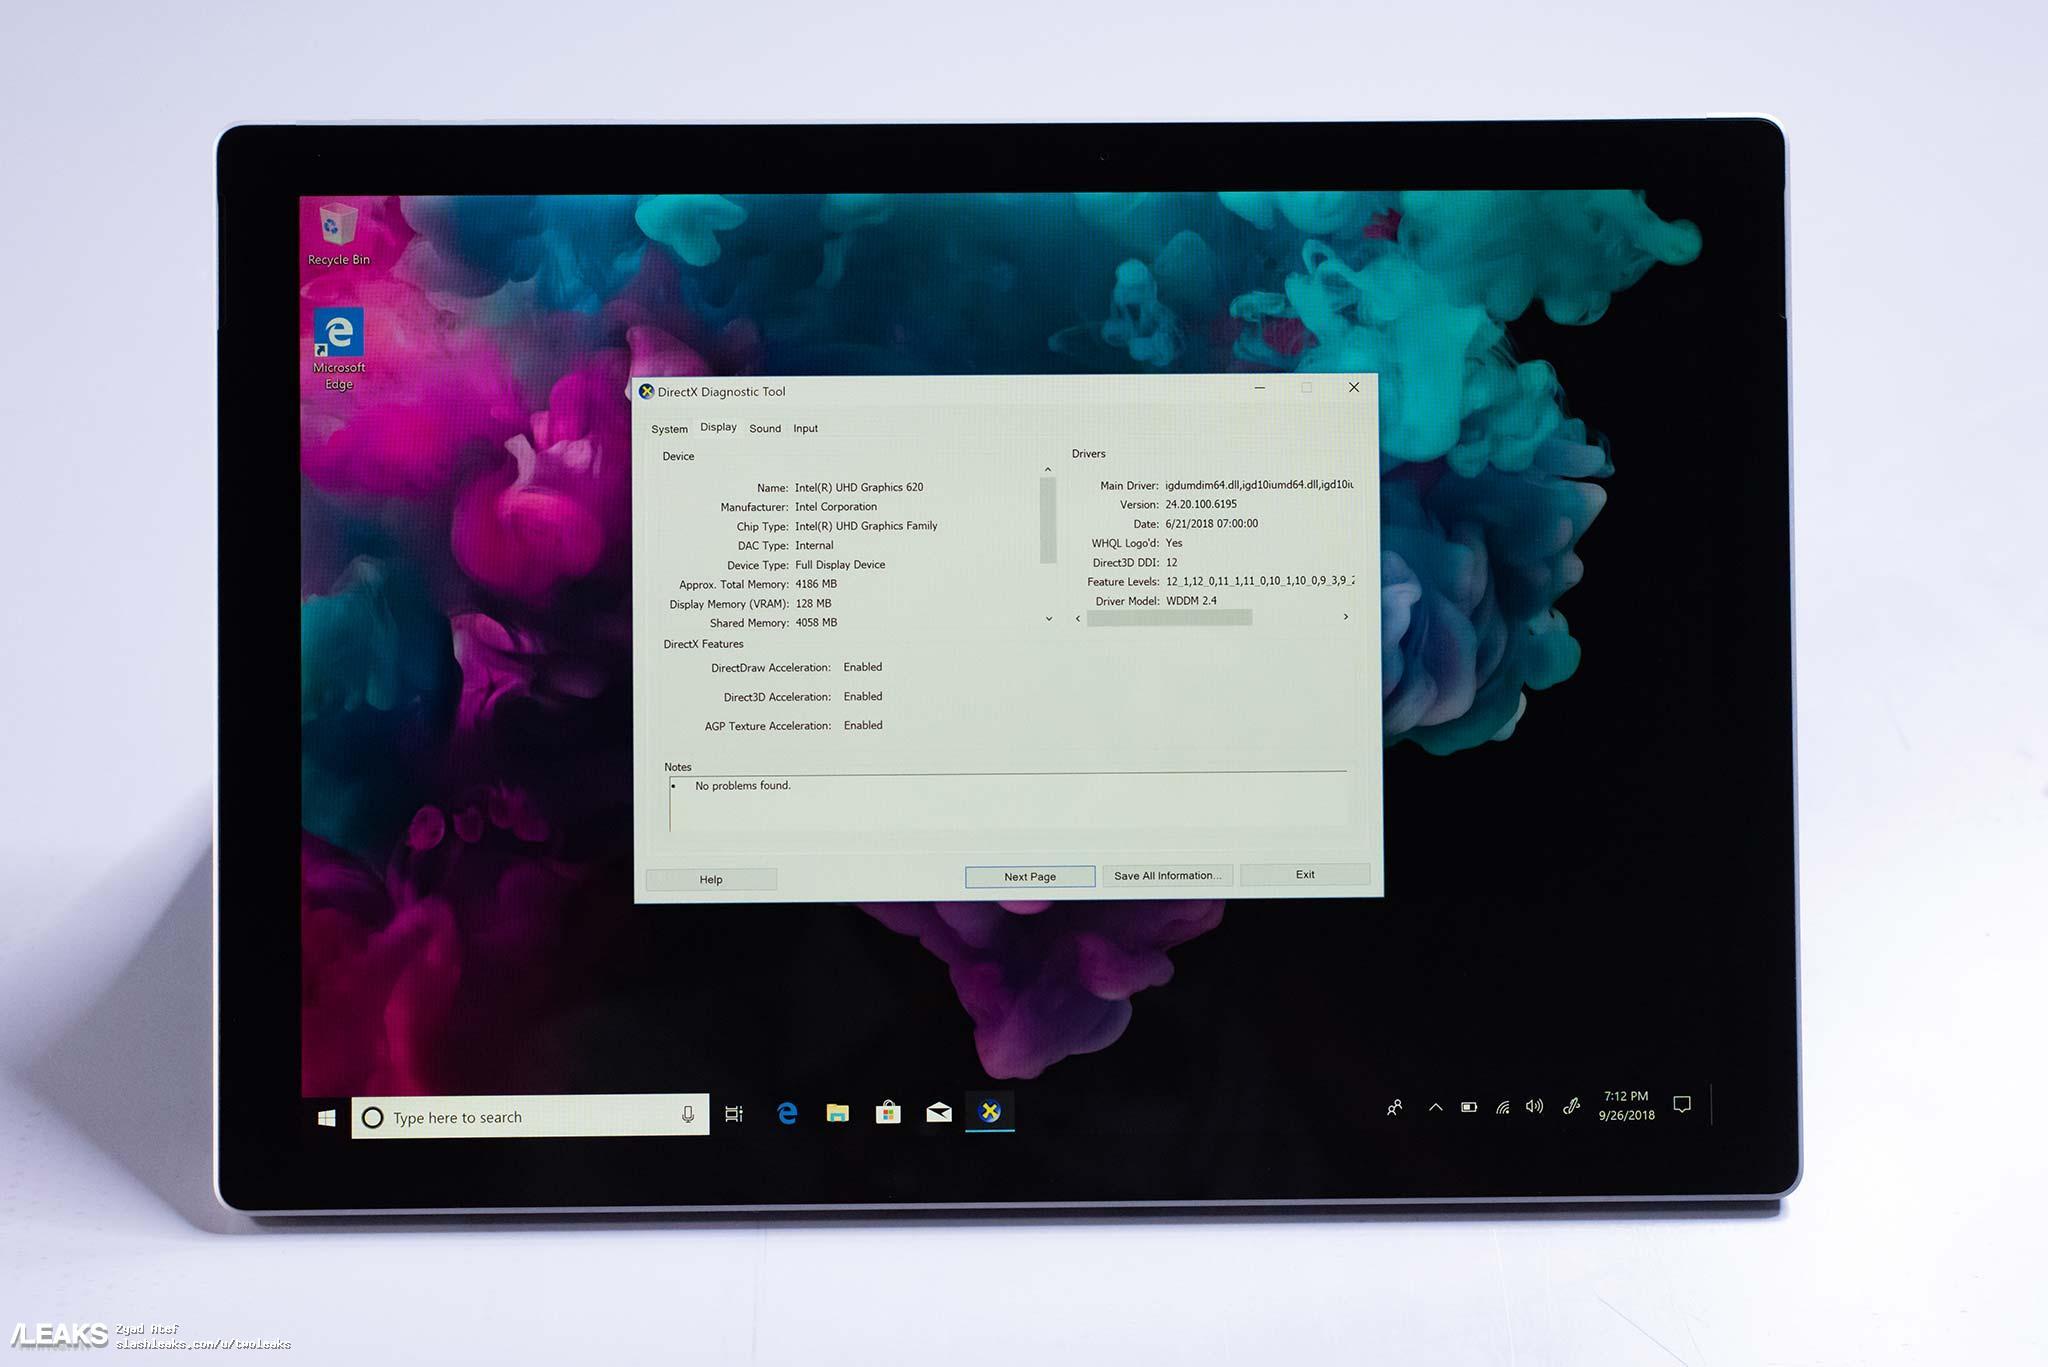 مایکروسافت سرفیس پرو 6 (Surface Pro 6) کاملا لو رفت